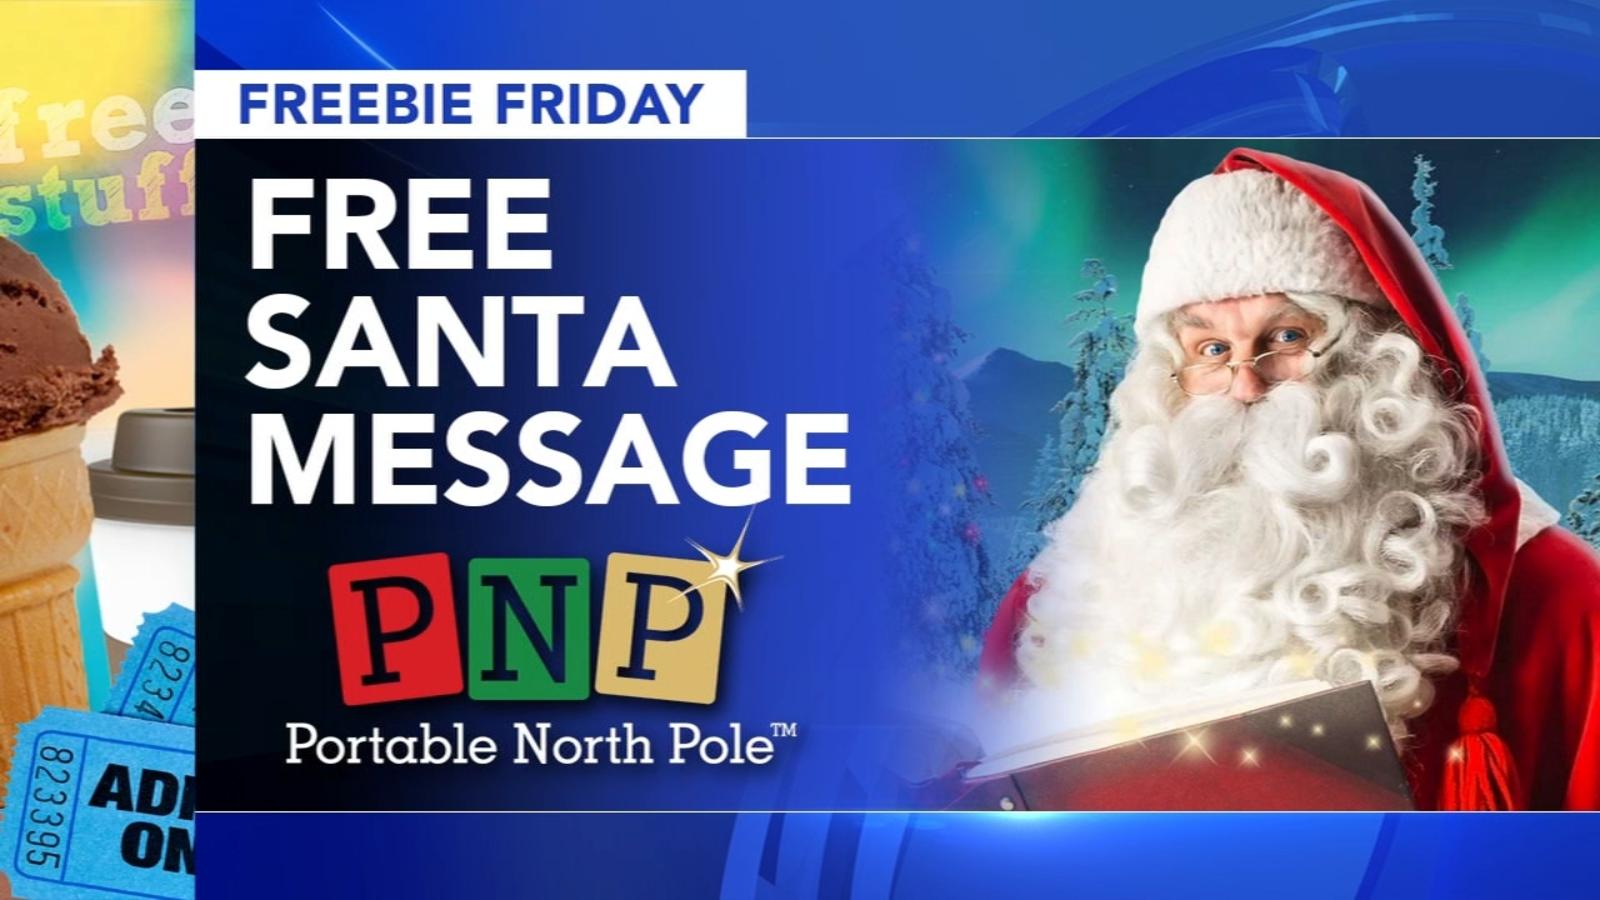 Pnp Santa Christmas Eve Message 2020 Freebie Friday: Pet photos with Santa, holiday sing along, pasta